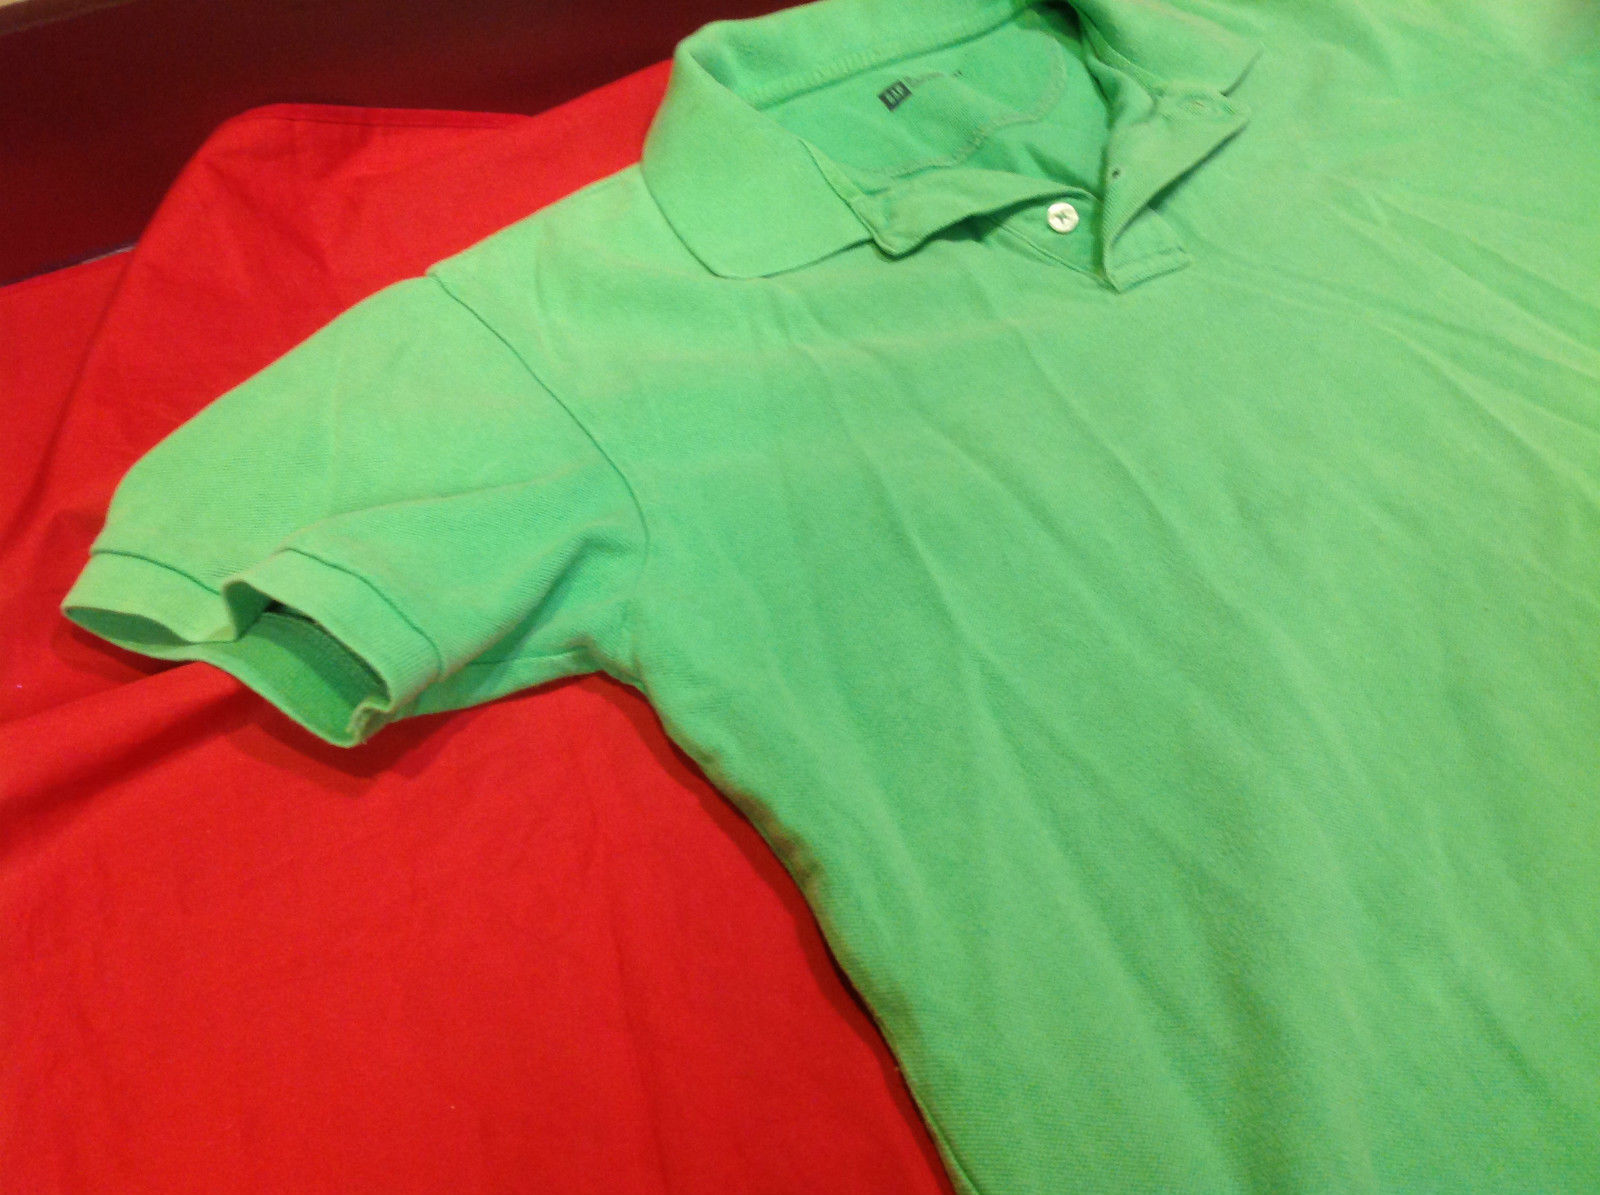 Gap Green/Lime Classic Fit Mens Short Sleeve Polo Shirt Size Medium image 3